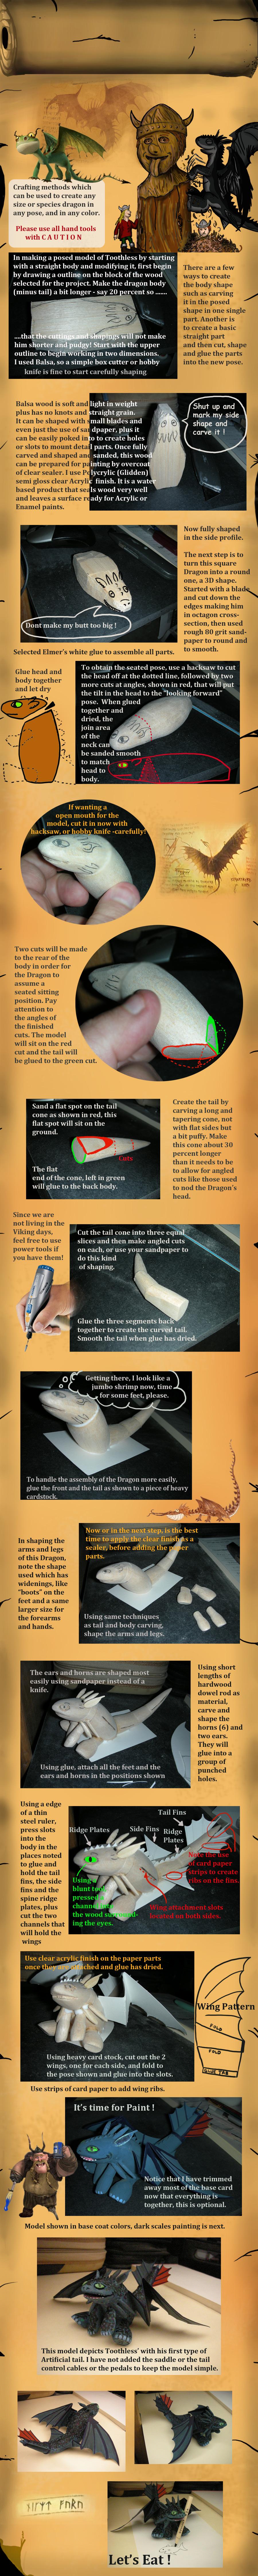 Tutorial on making wooden dragon models by Rekalnus